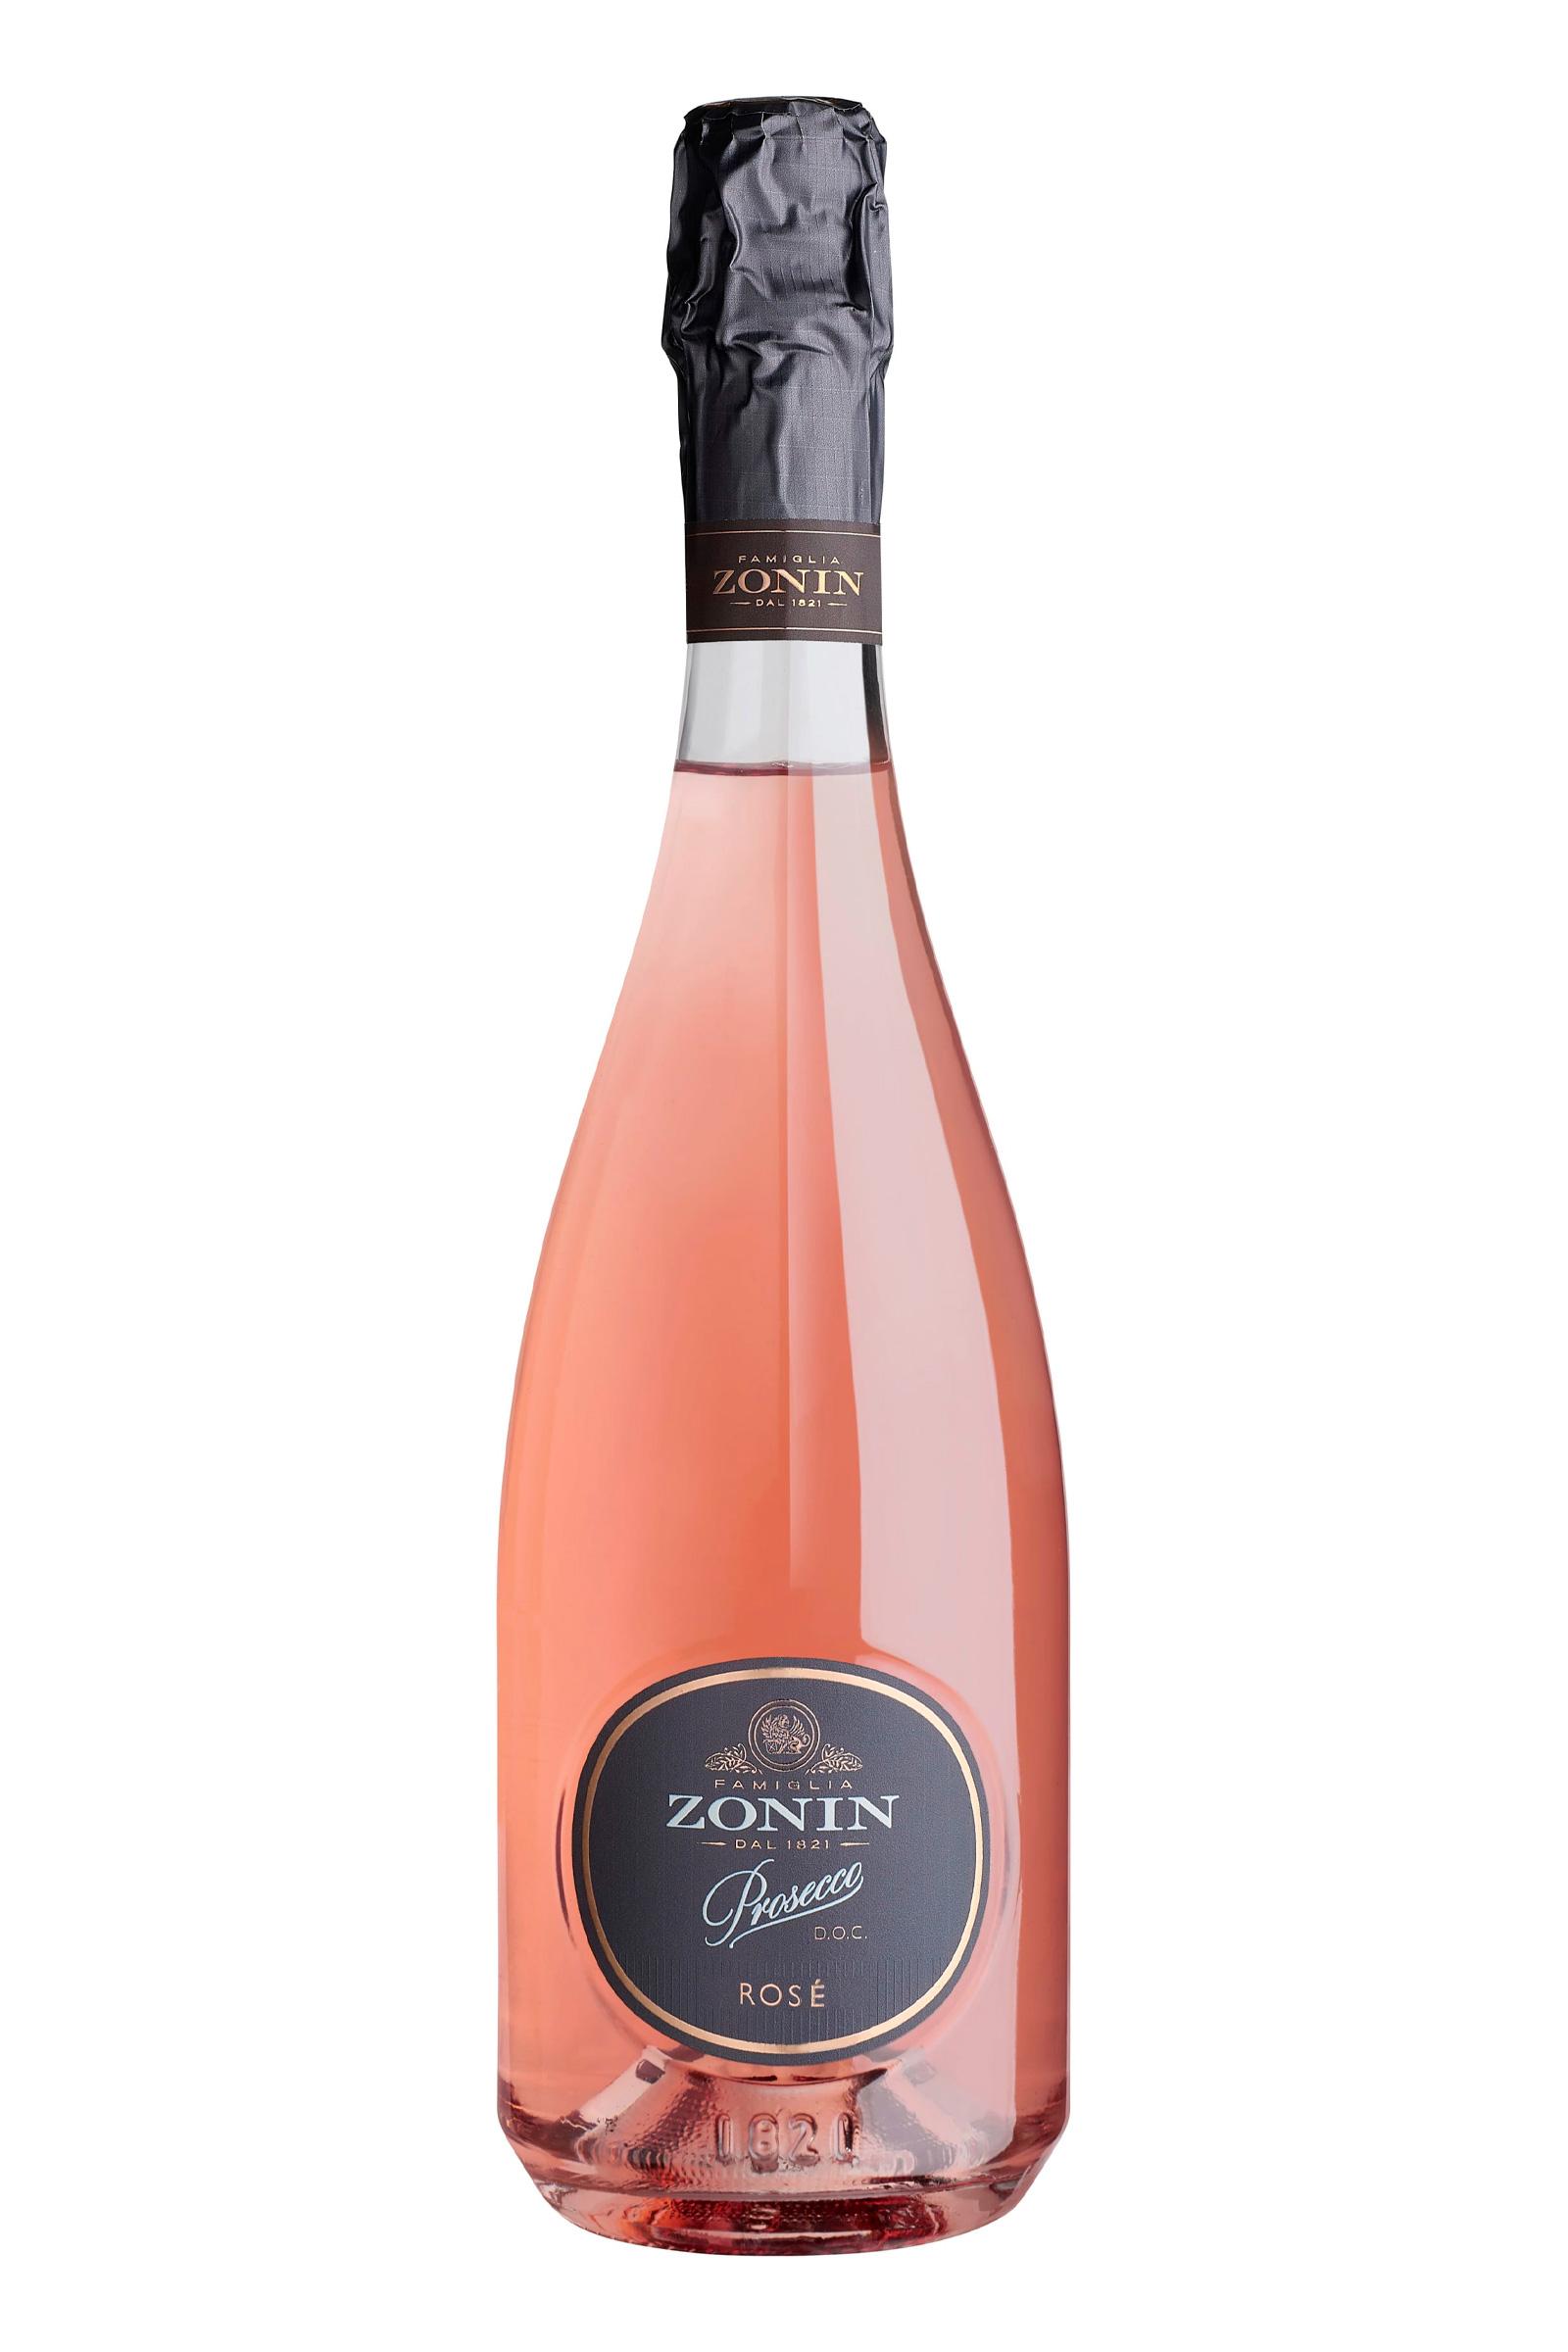 Zonin Rose Prosecco Millesimato 750ml